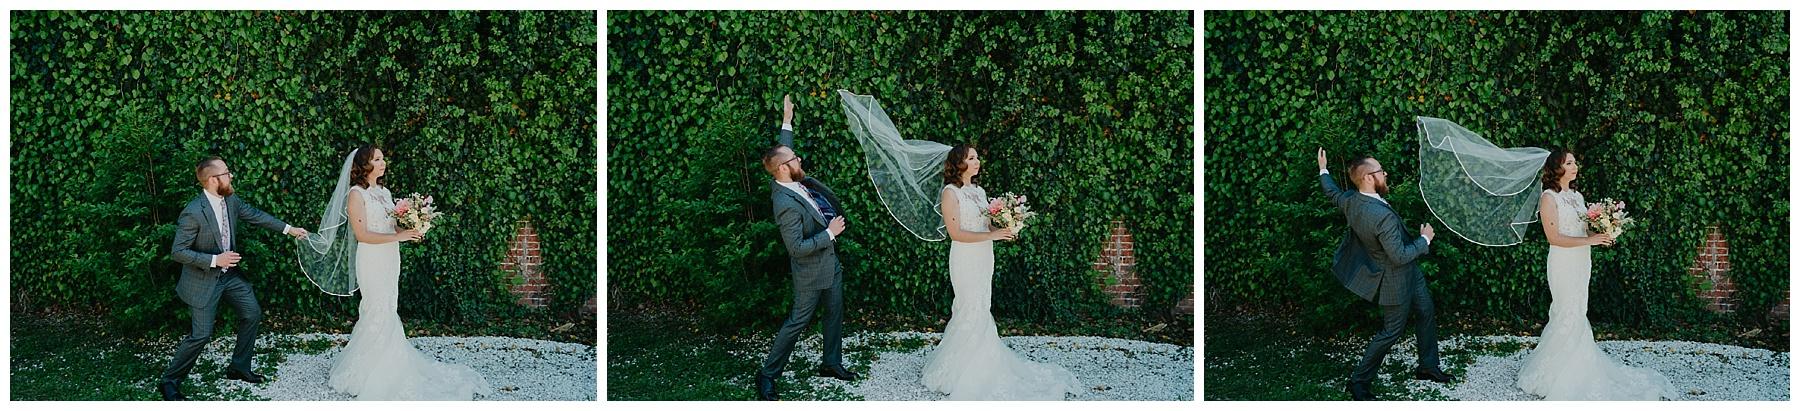 the_ravington_wedding_arkansas_0022.jpg